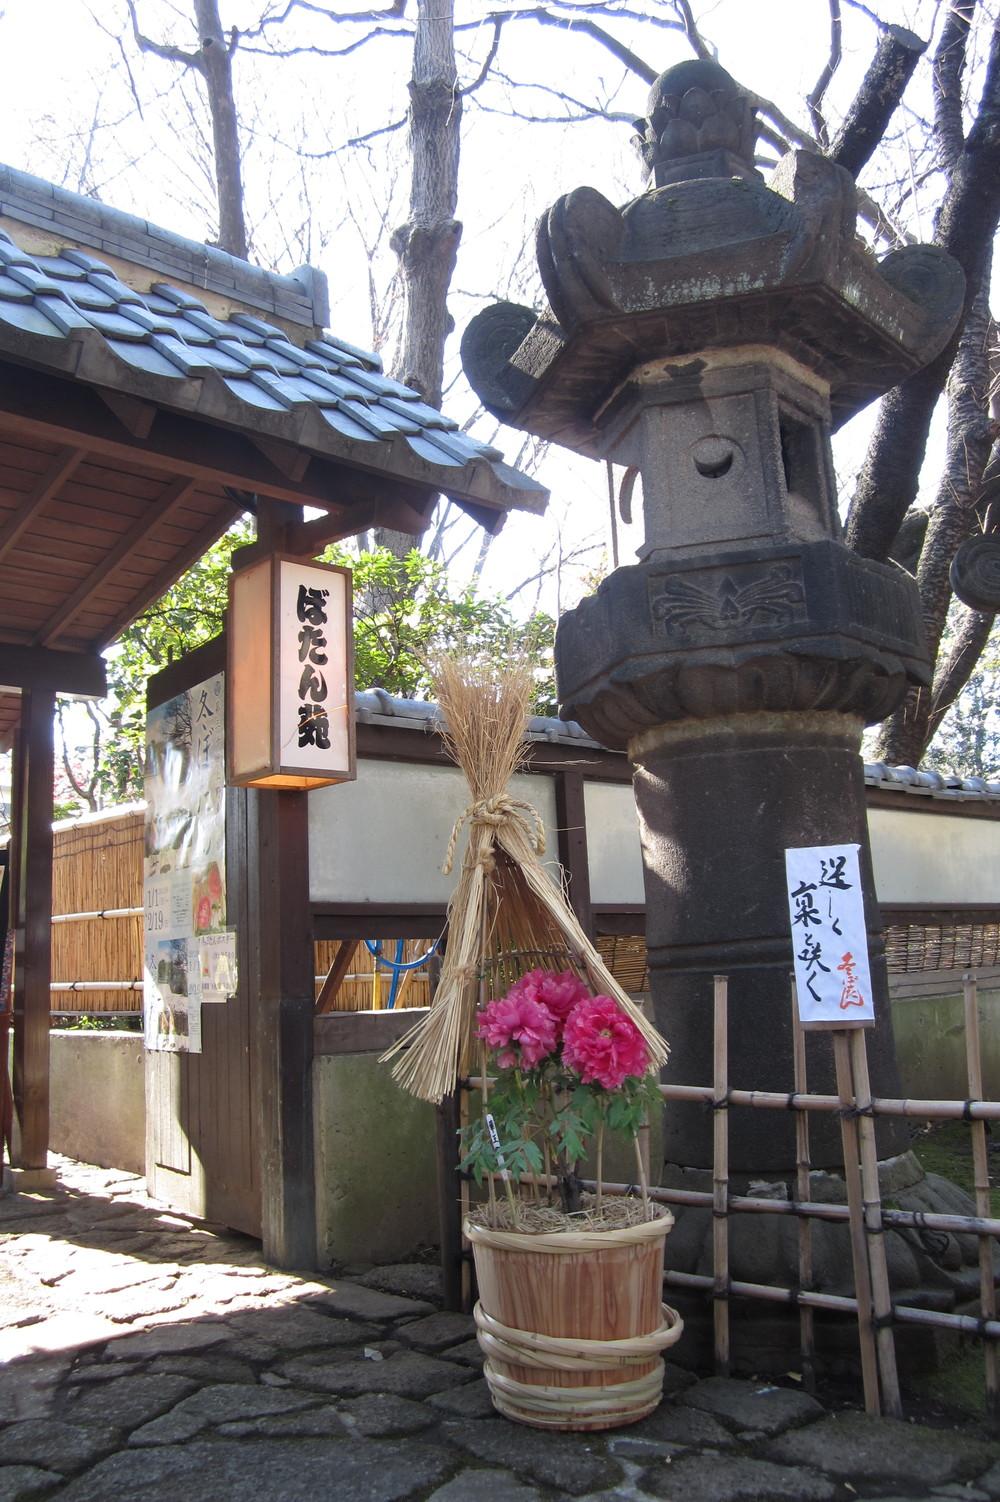 Tokyo, Day 1: Ueno, Peonies & Wishes